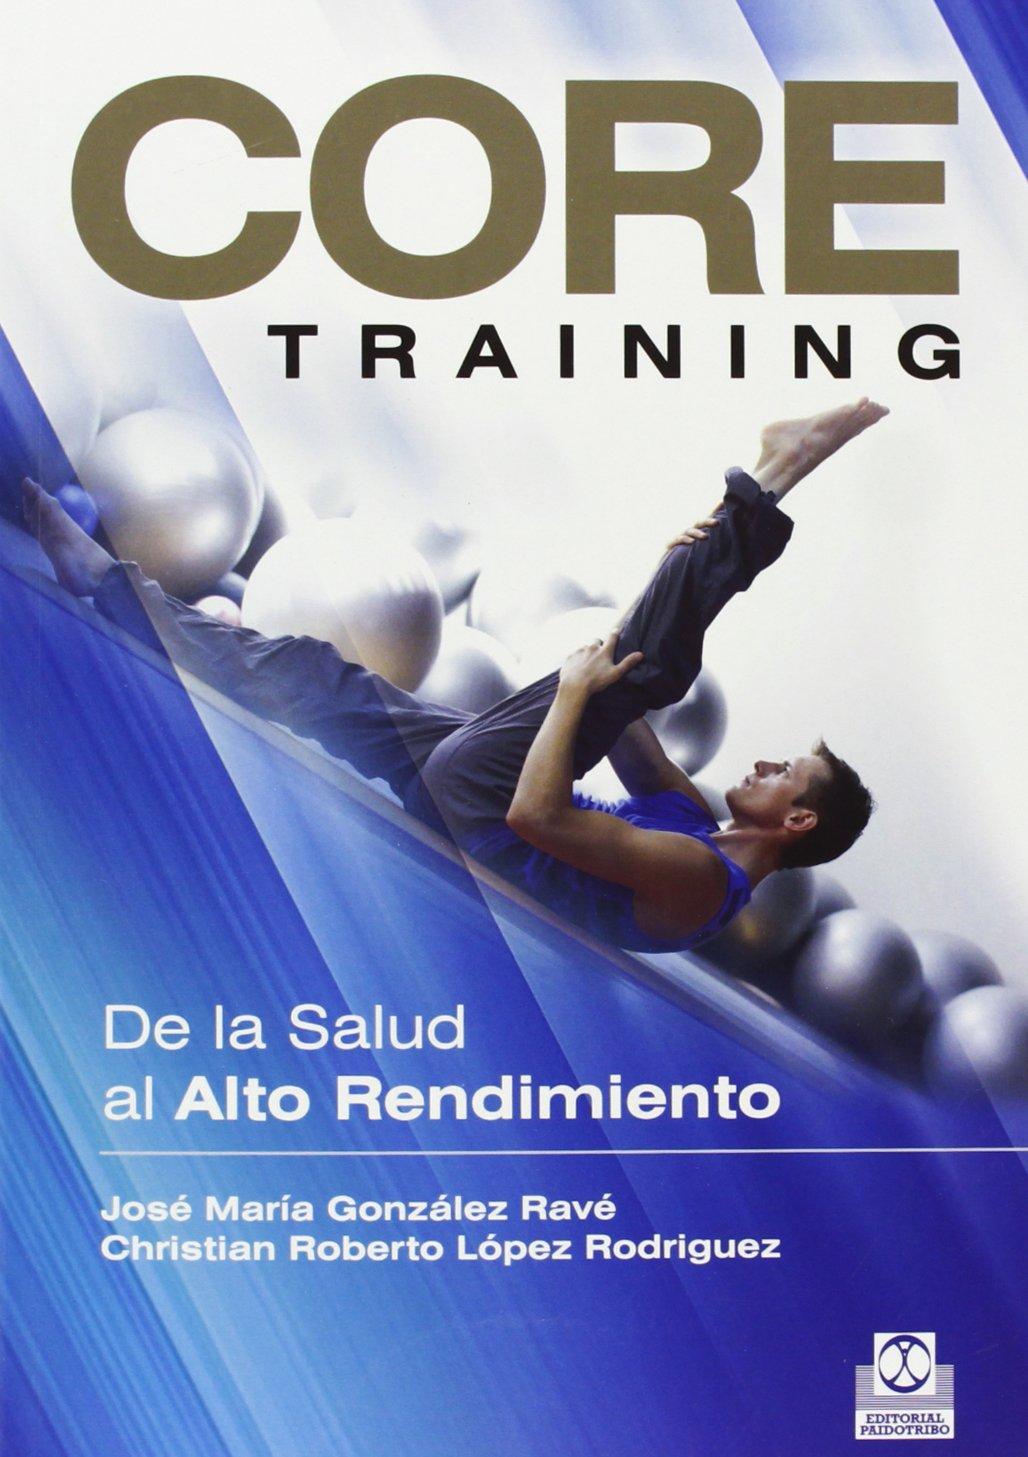 Core Training (Deportes) Tapa blanda – 4 dic 2013 José María González Ravé Paidotribo 8499101933